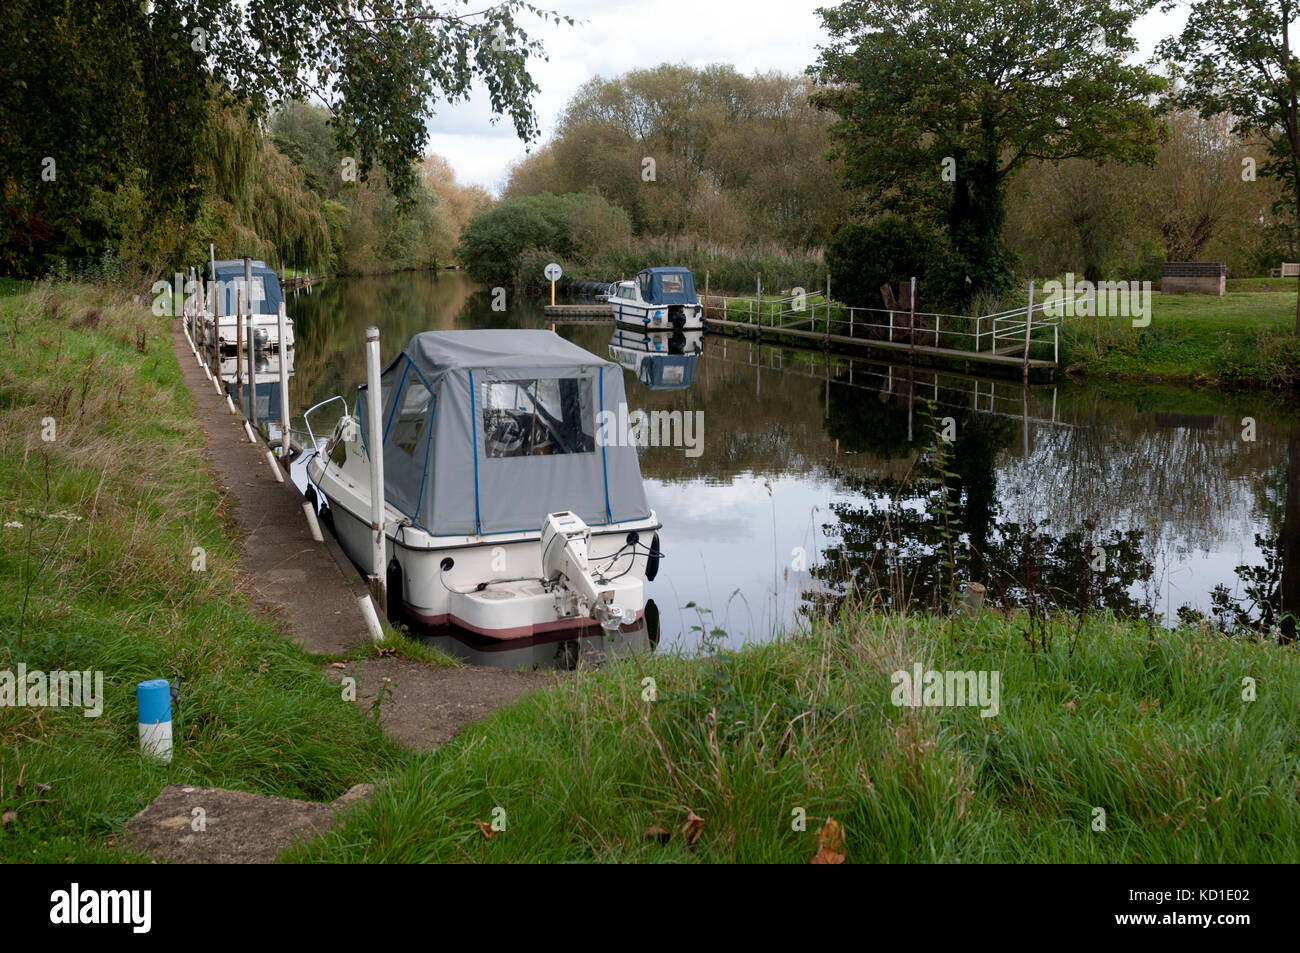 Cabin cruisers moored on the River Avon, Luddington, Warwickshire, England, UK - Stock Image